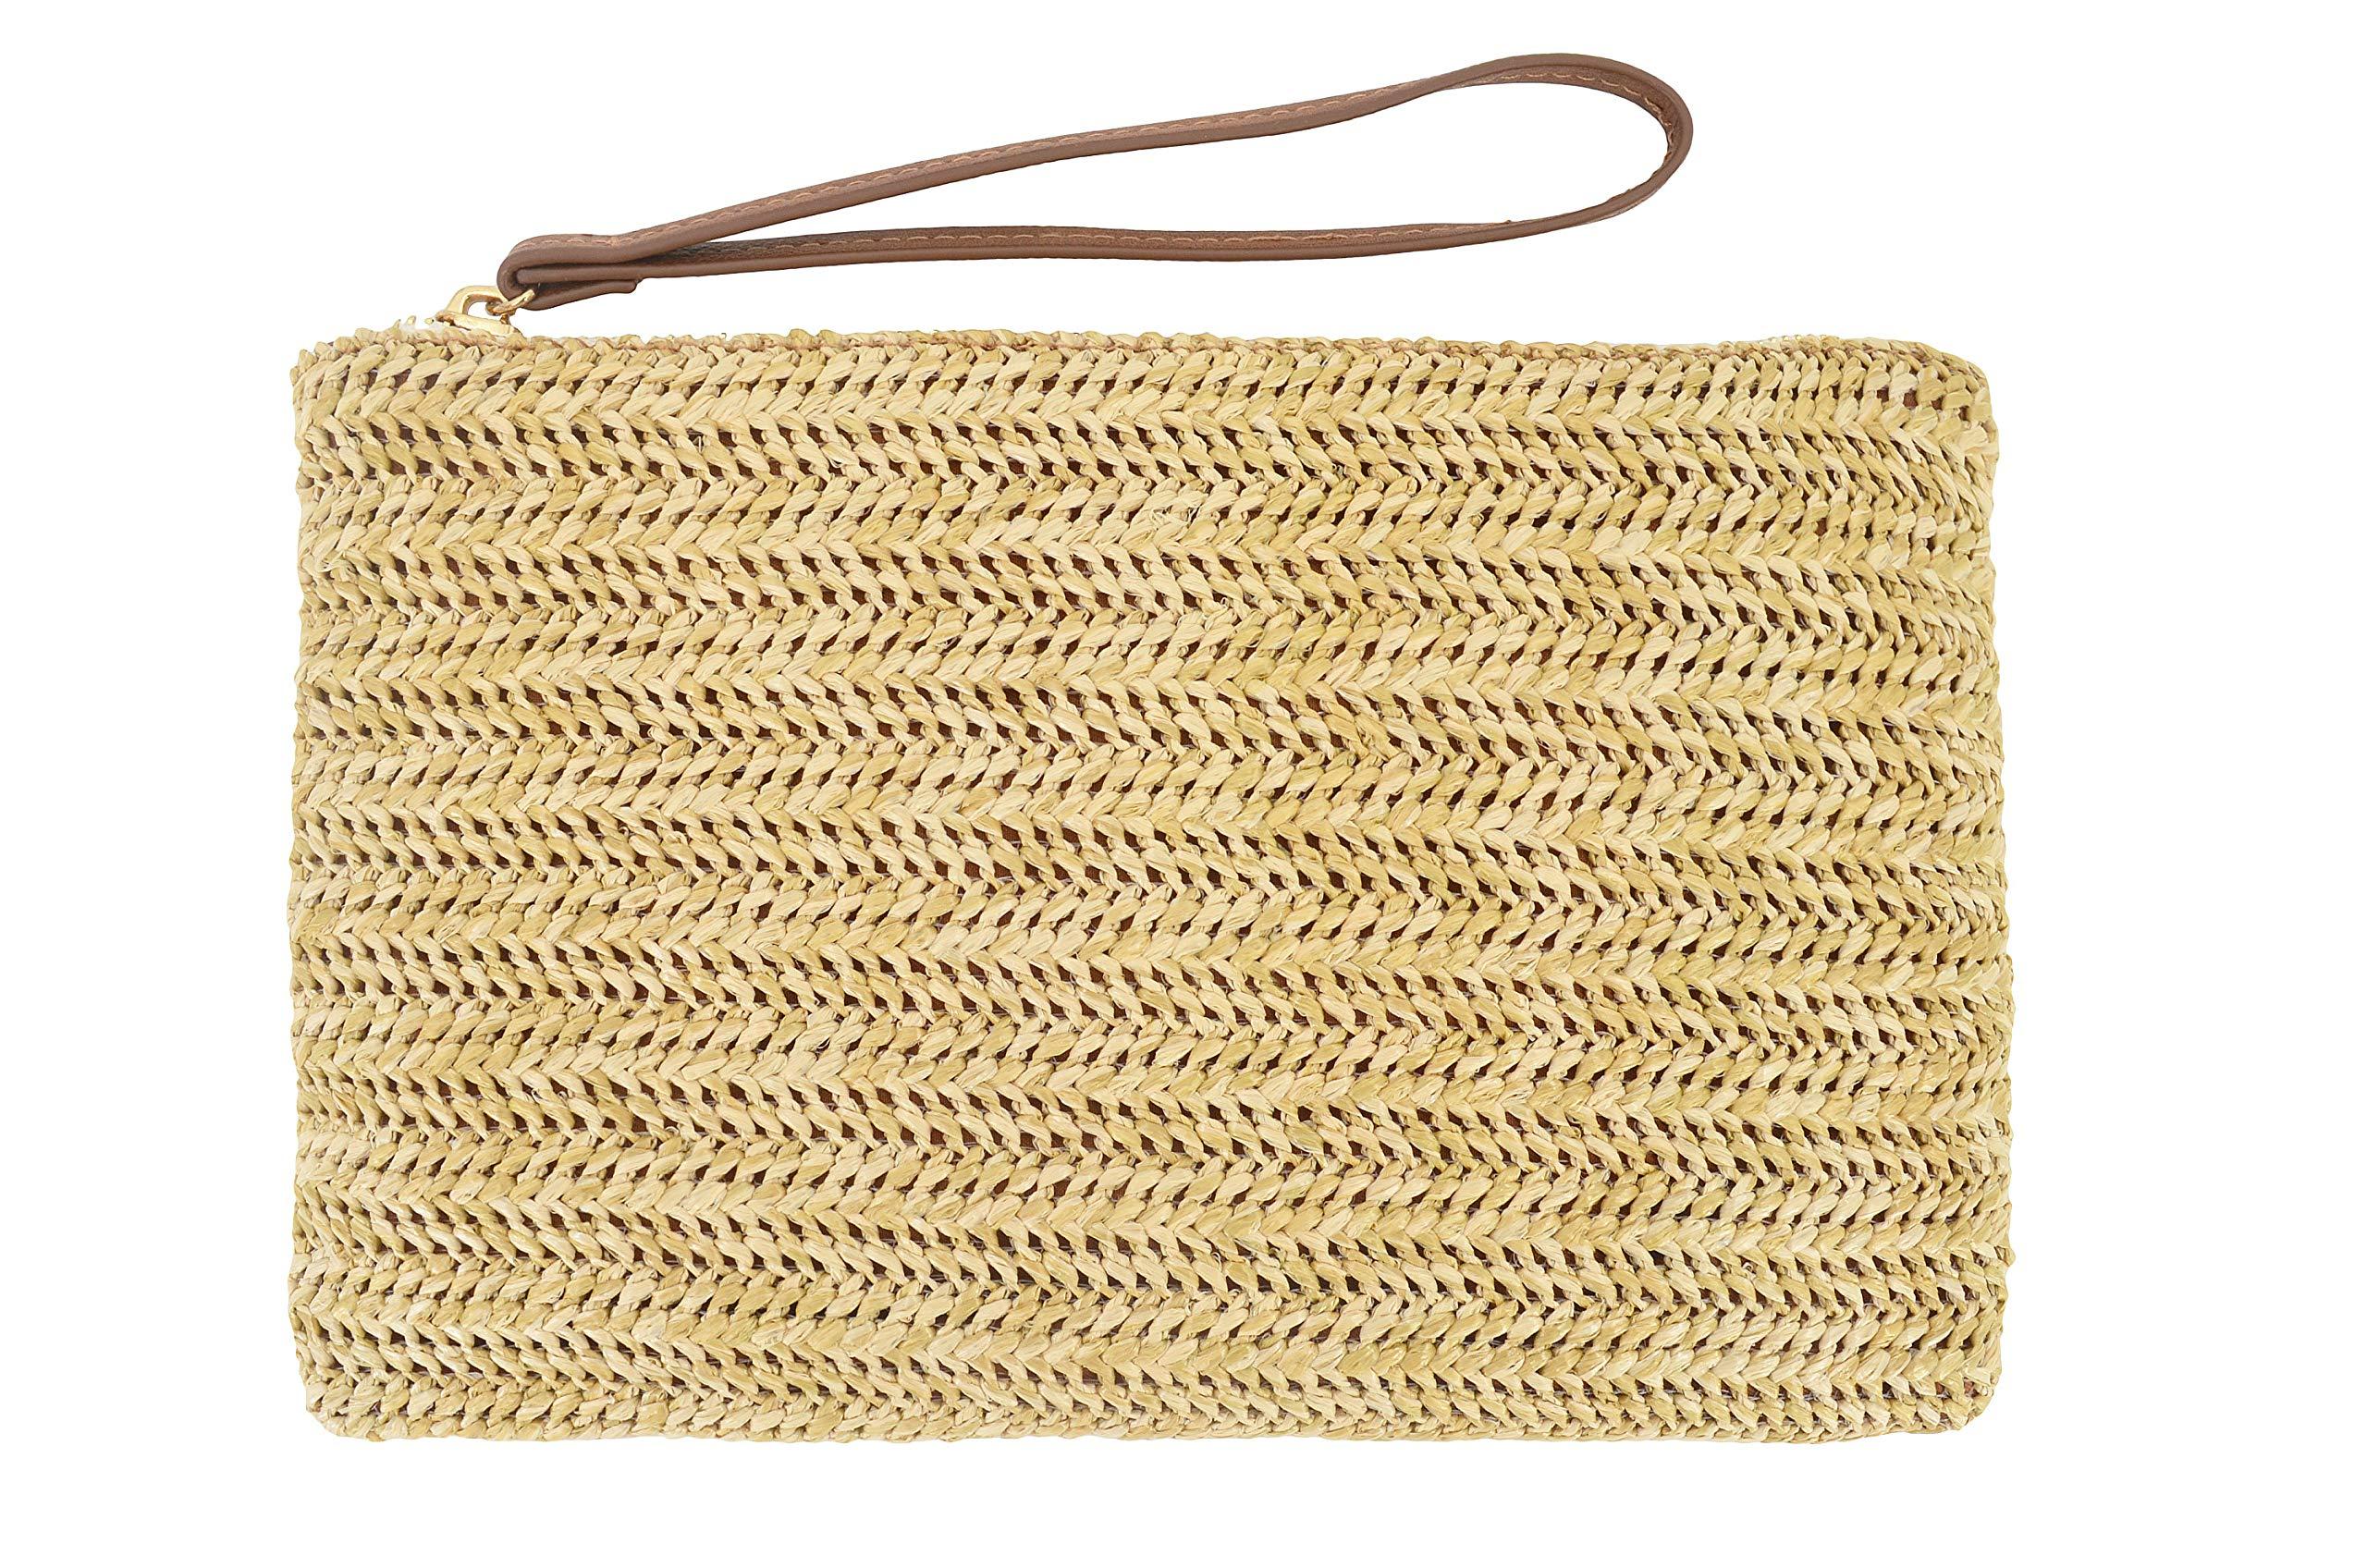 AGNETA Women's Hand Wrist Type Straw Clutch Summer Beach Sea Handbag (Beige Small)